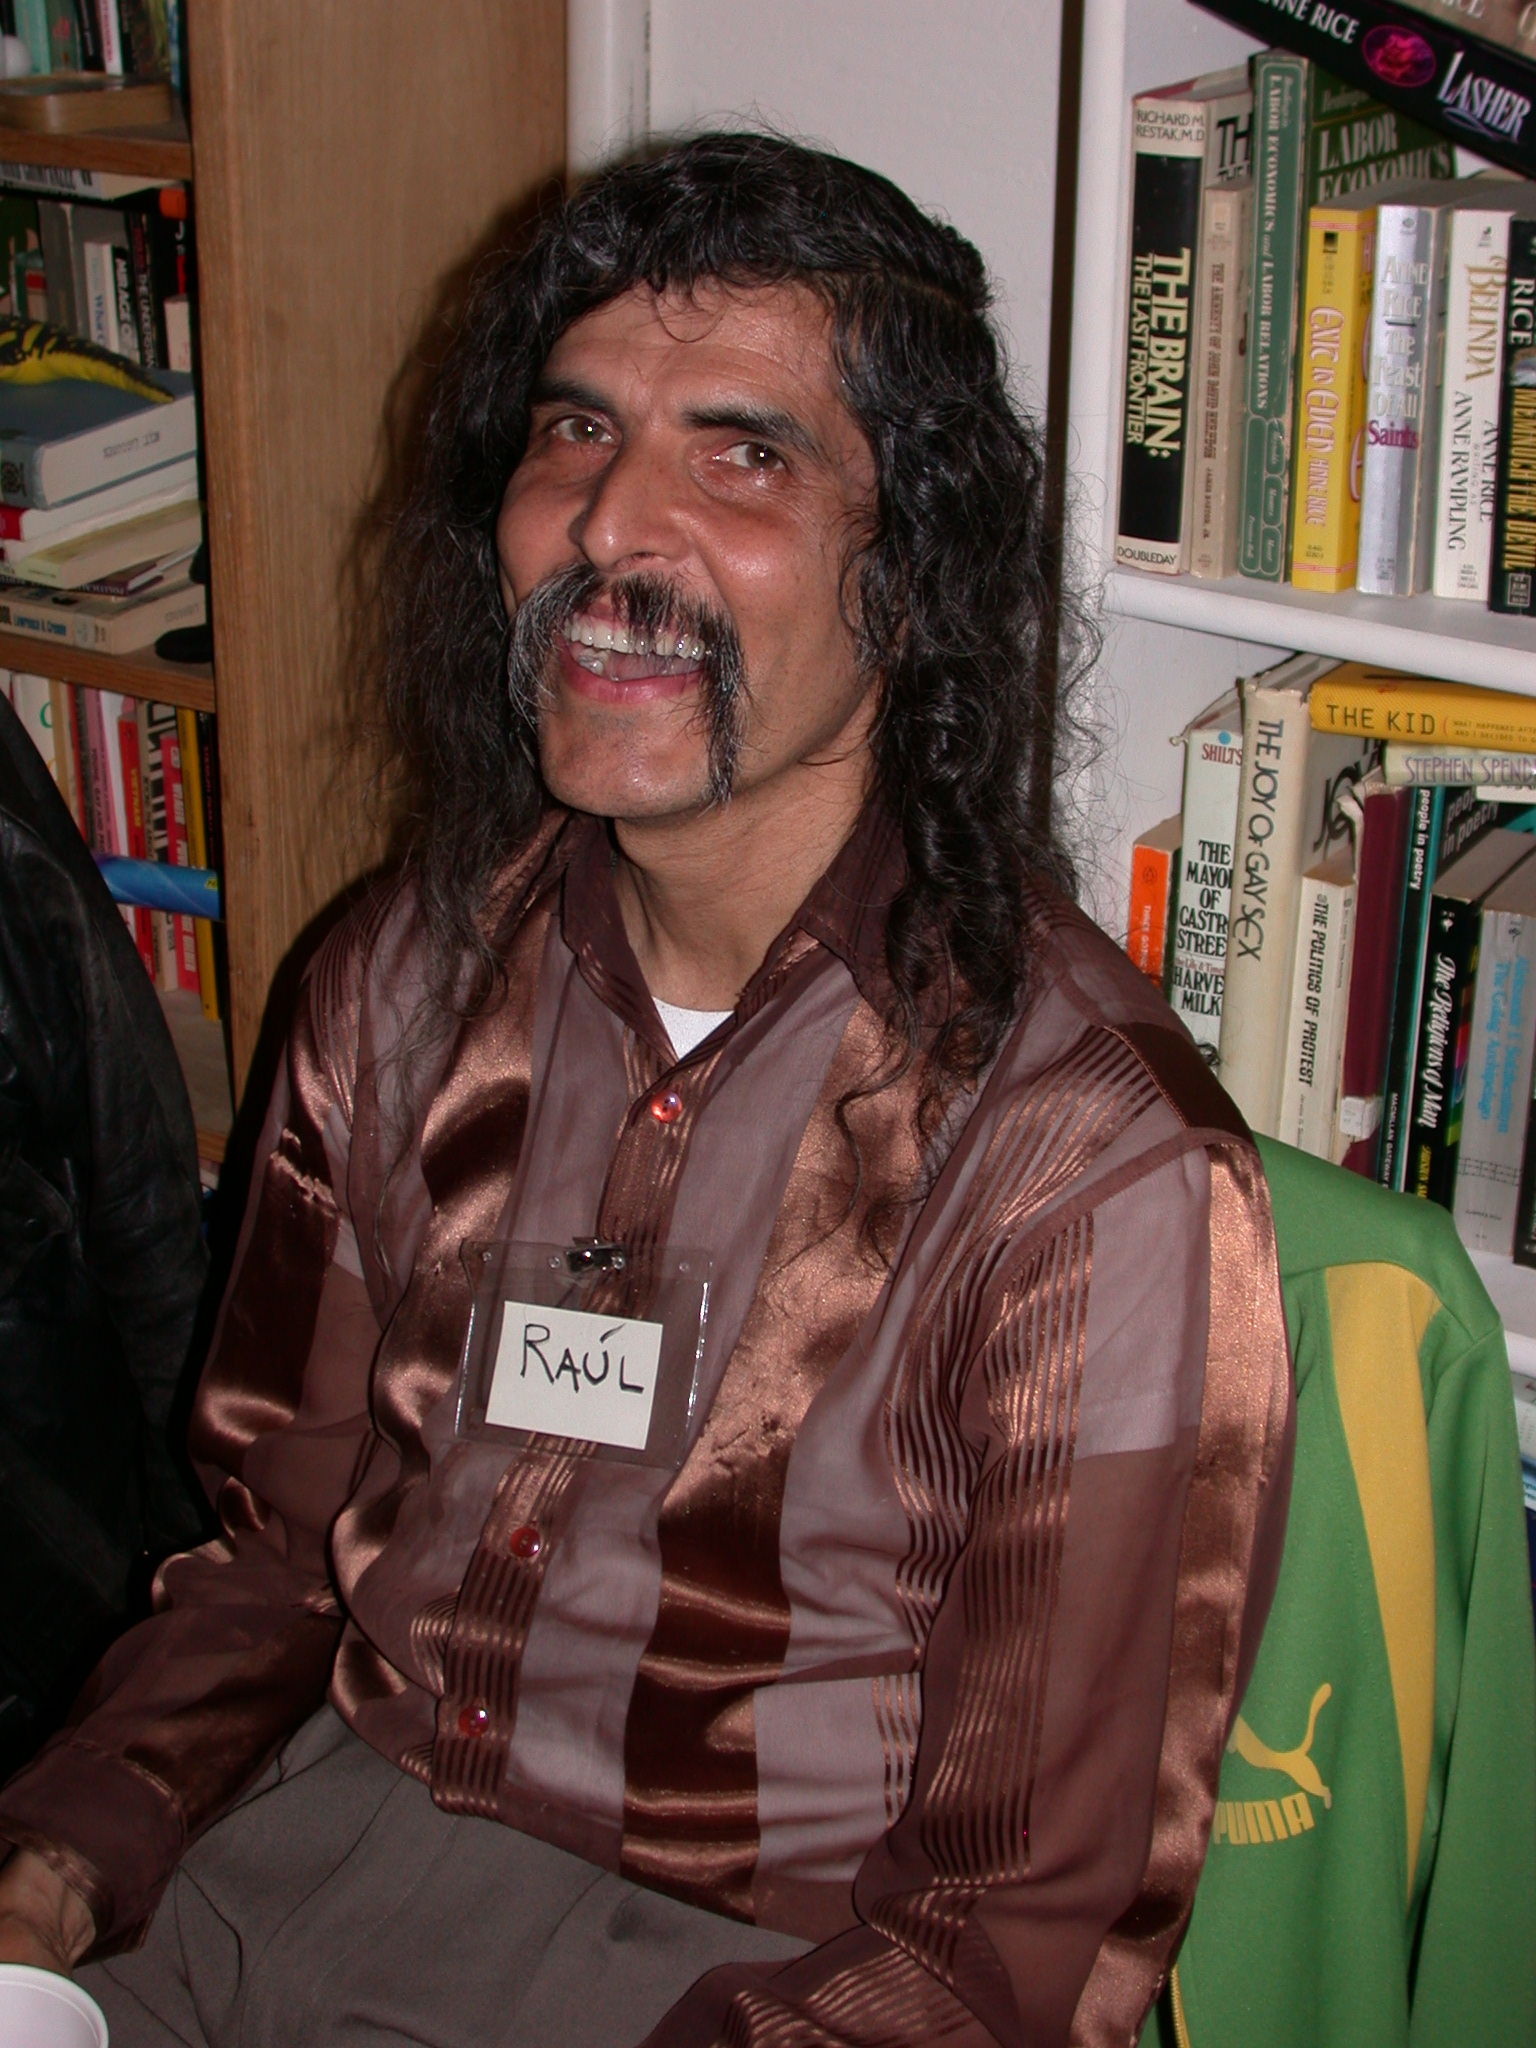 Raul Stunned